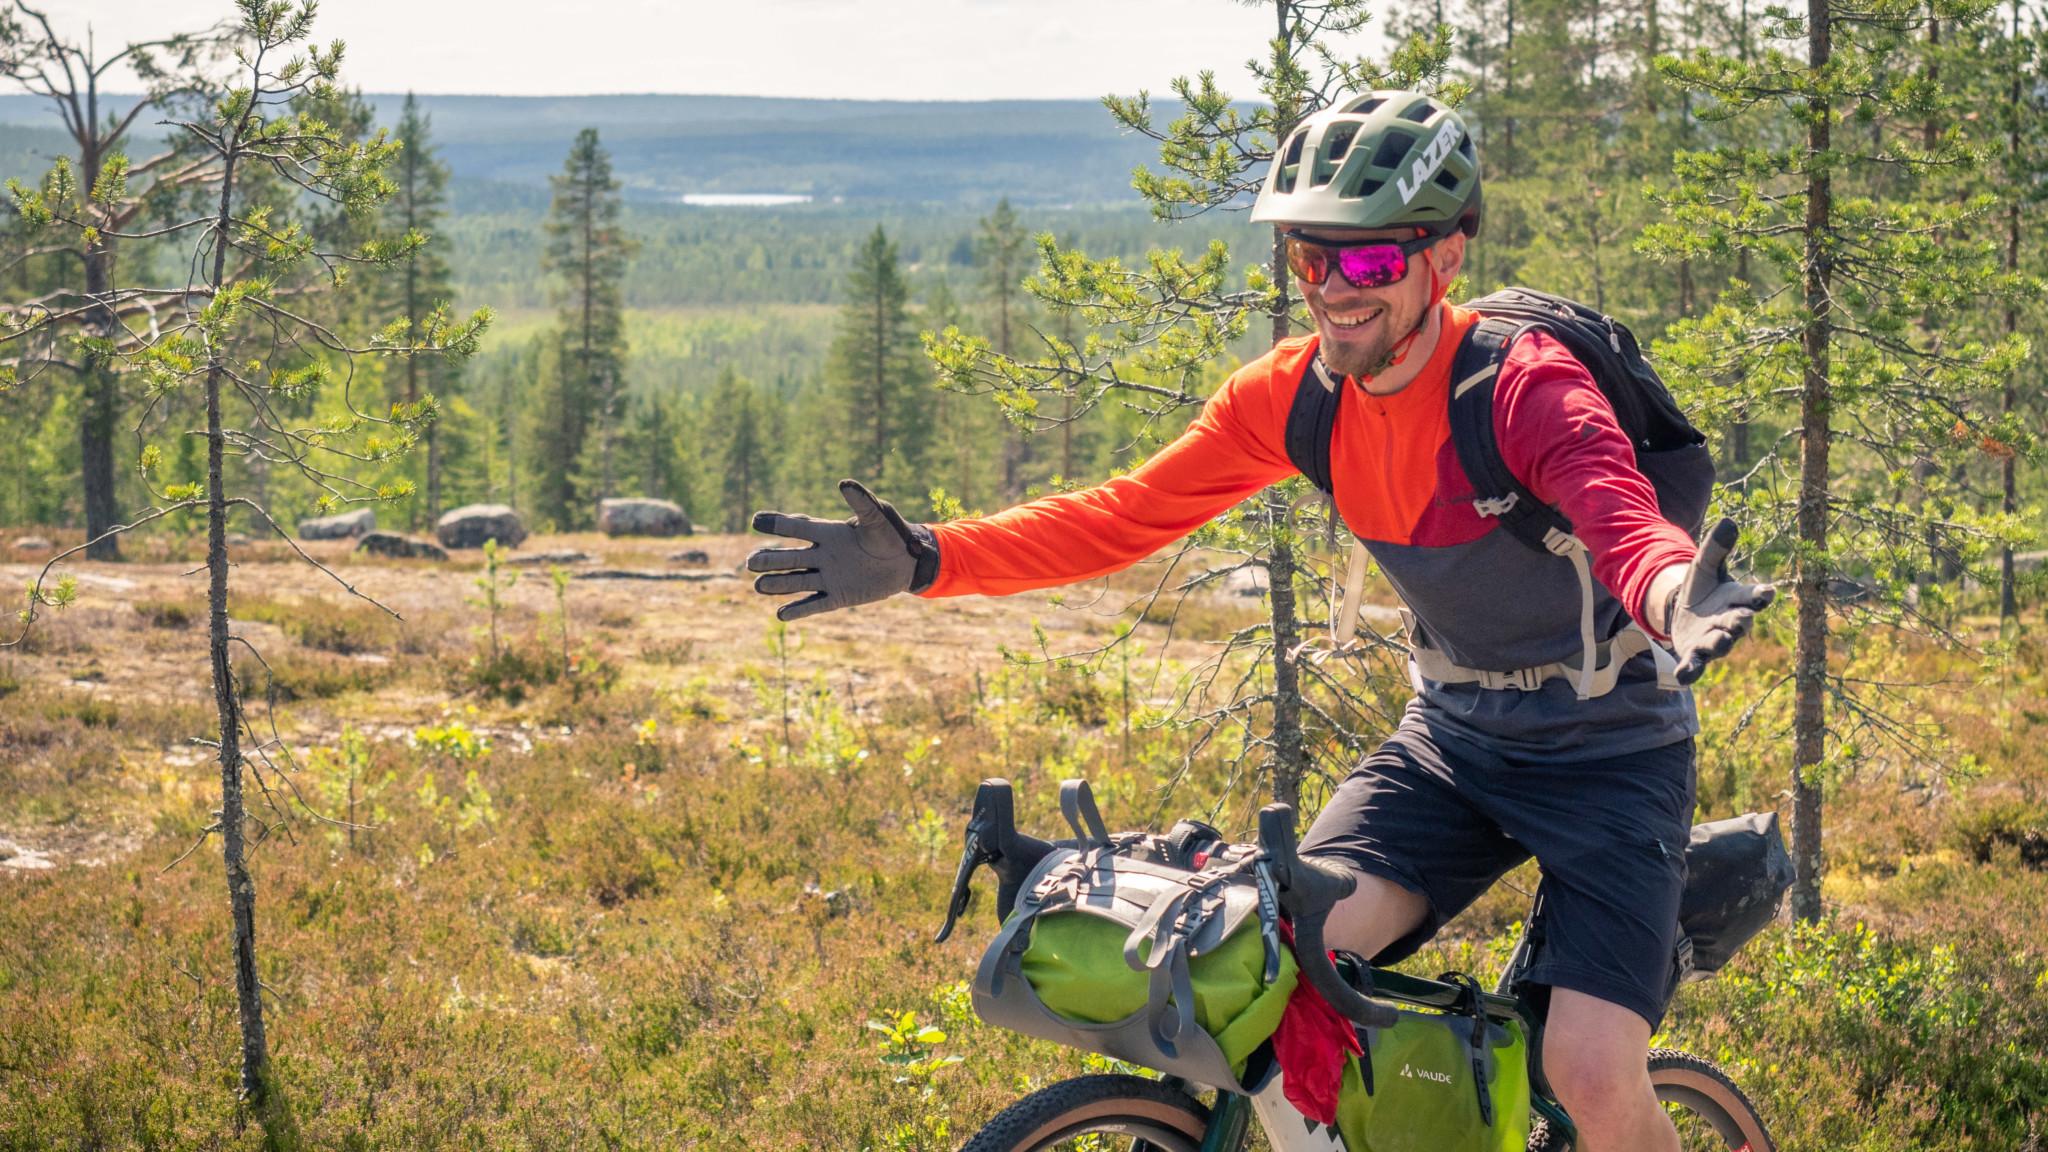 mountainiking Rovaniemi Lapland Finland